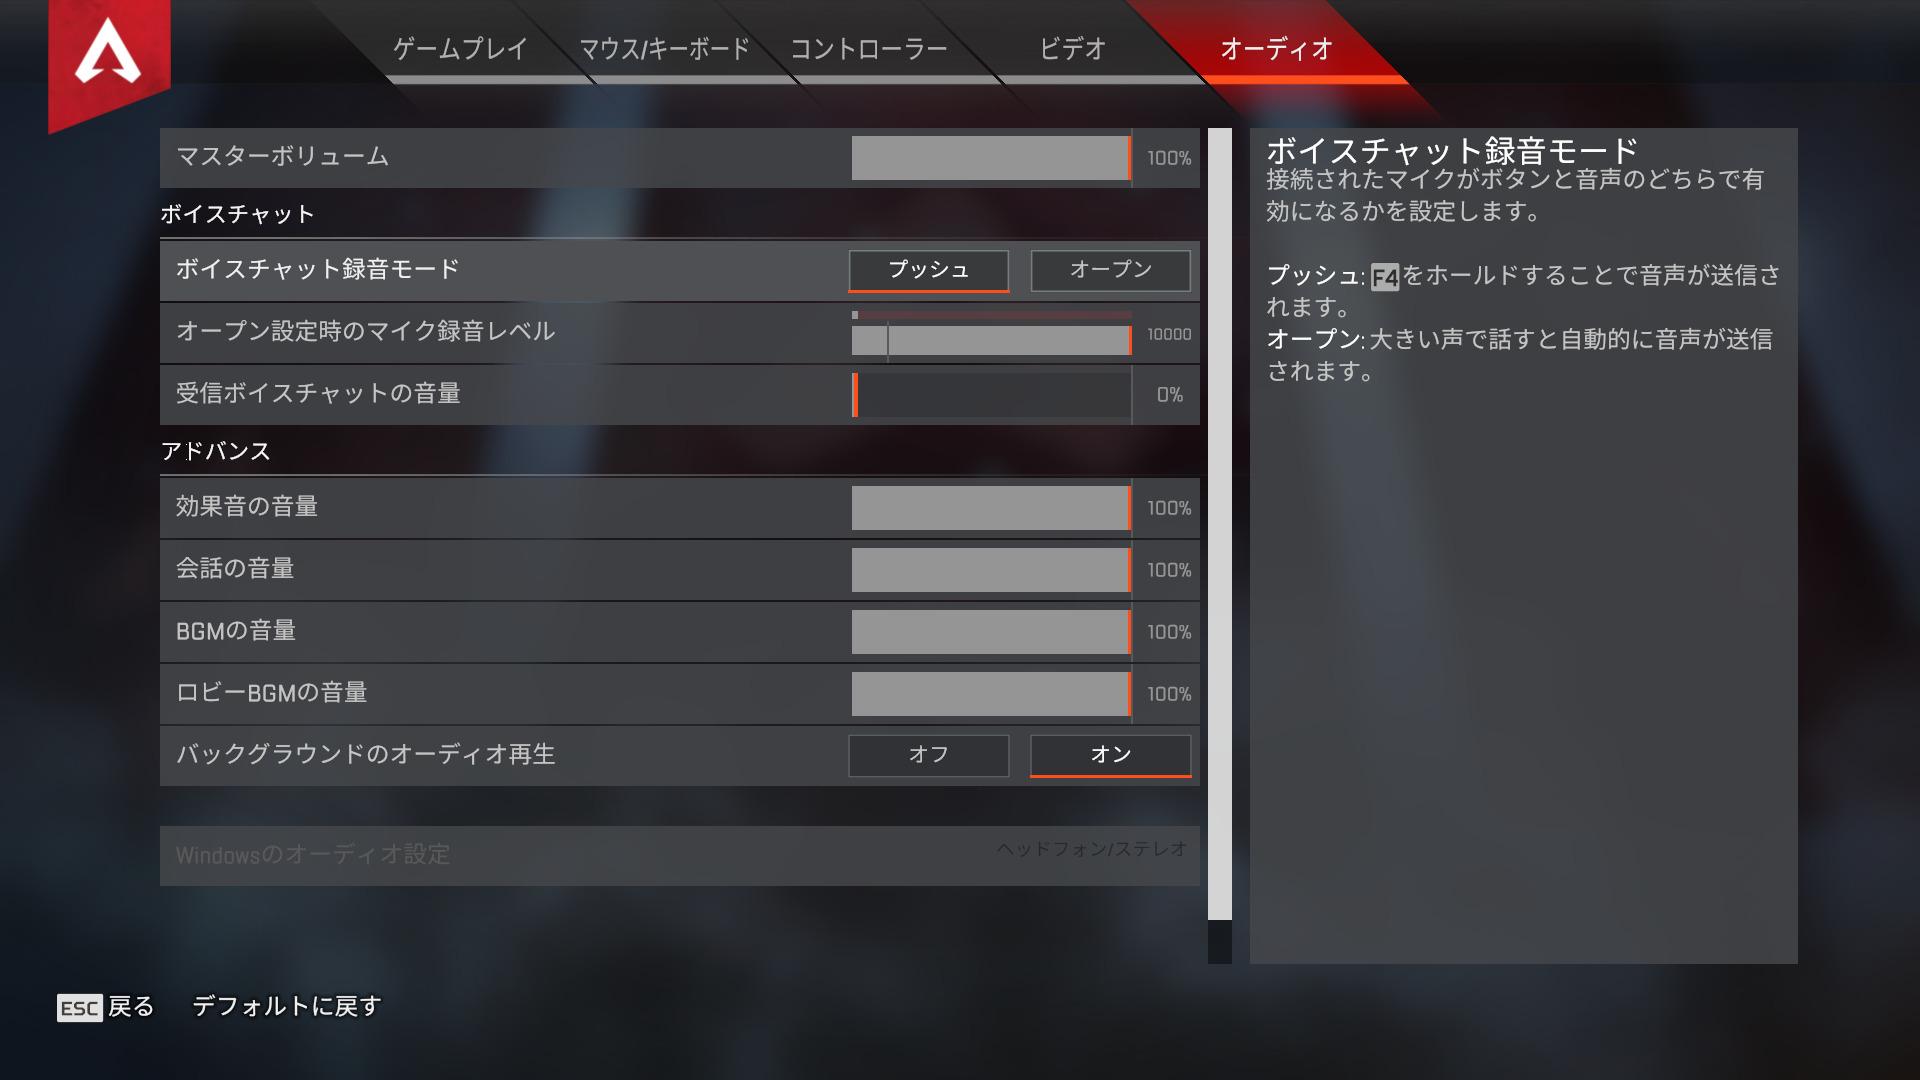 【PC版 Apex Legends】ボイスチャットをオフにする設定方法【エーペックスレジェンズ】